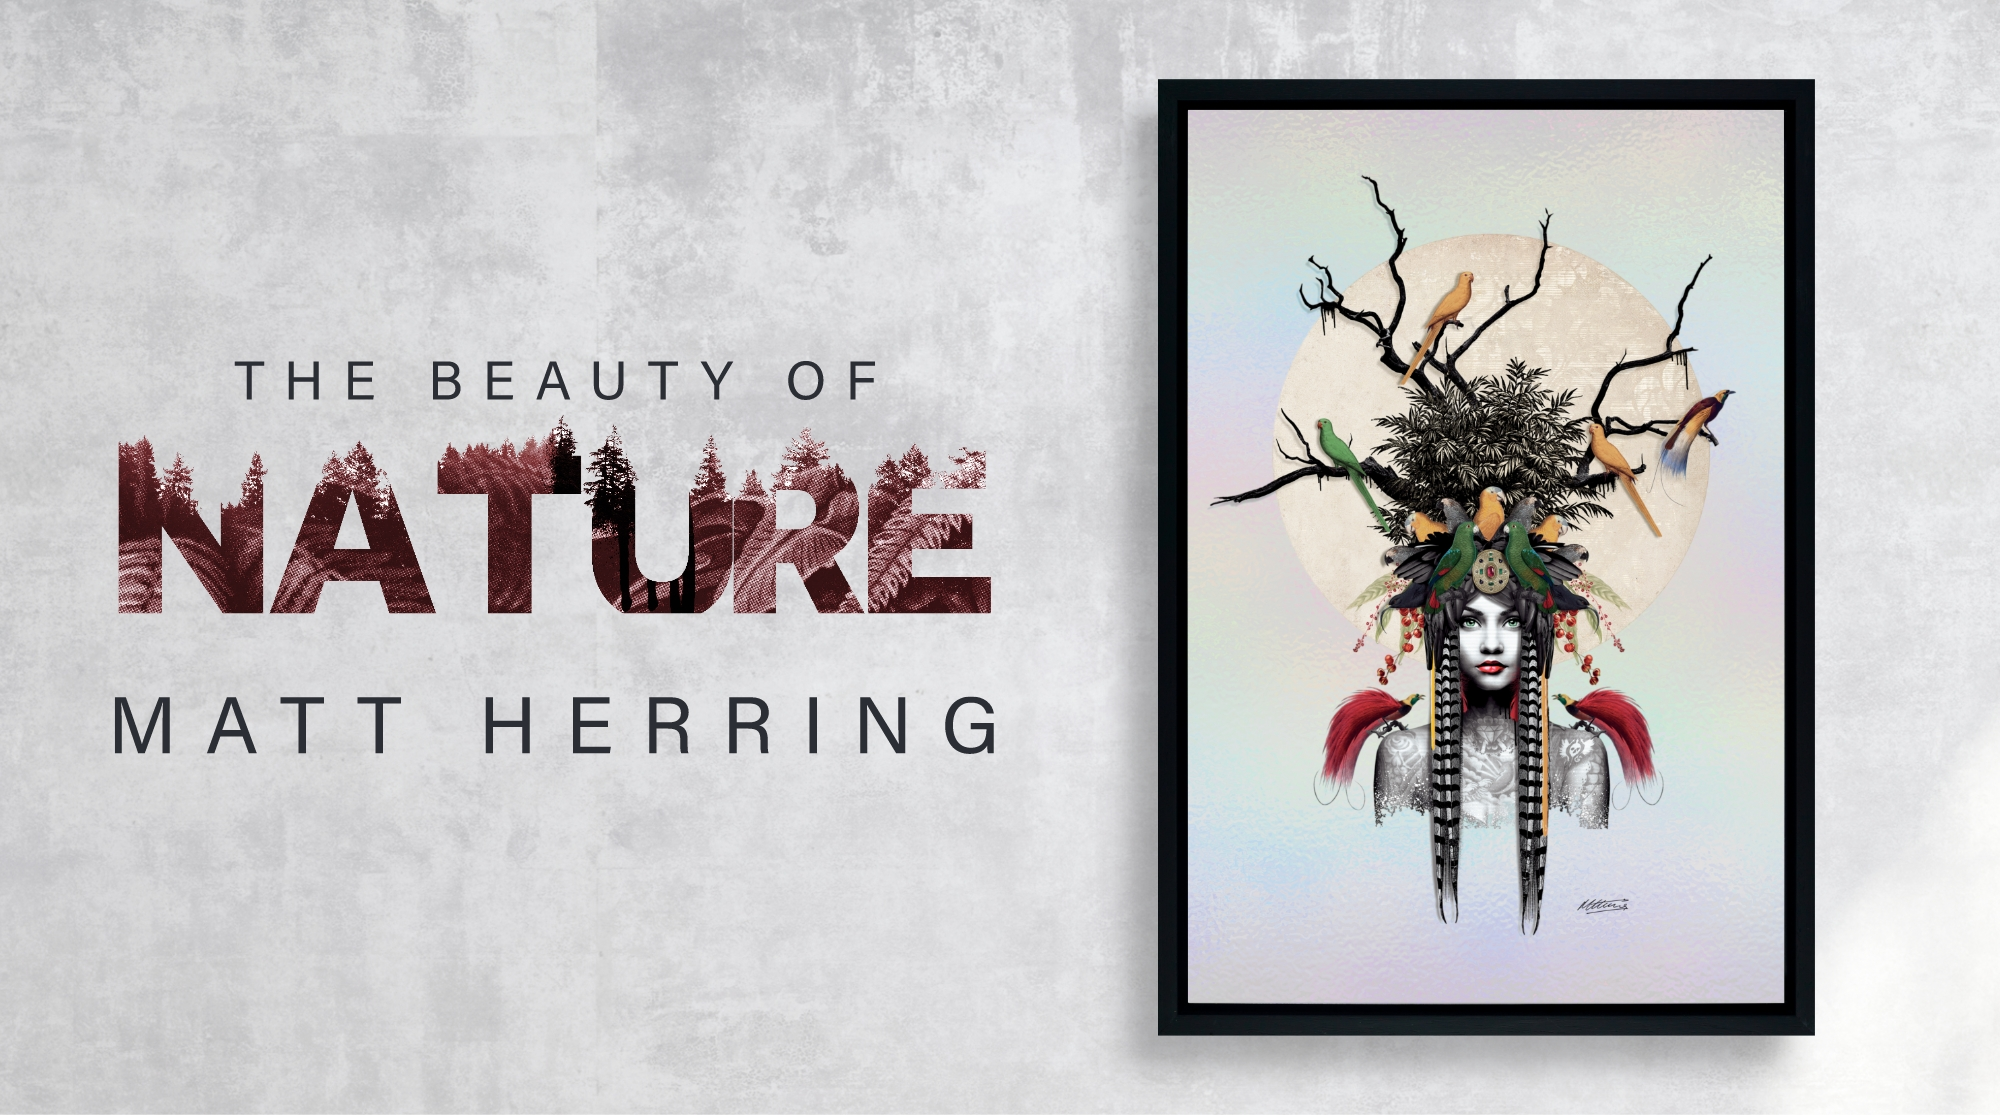 Introducing Matt Herring  image